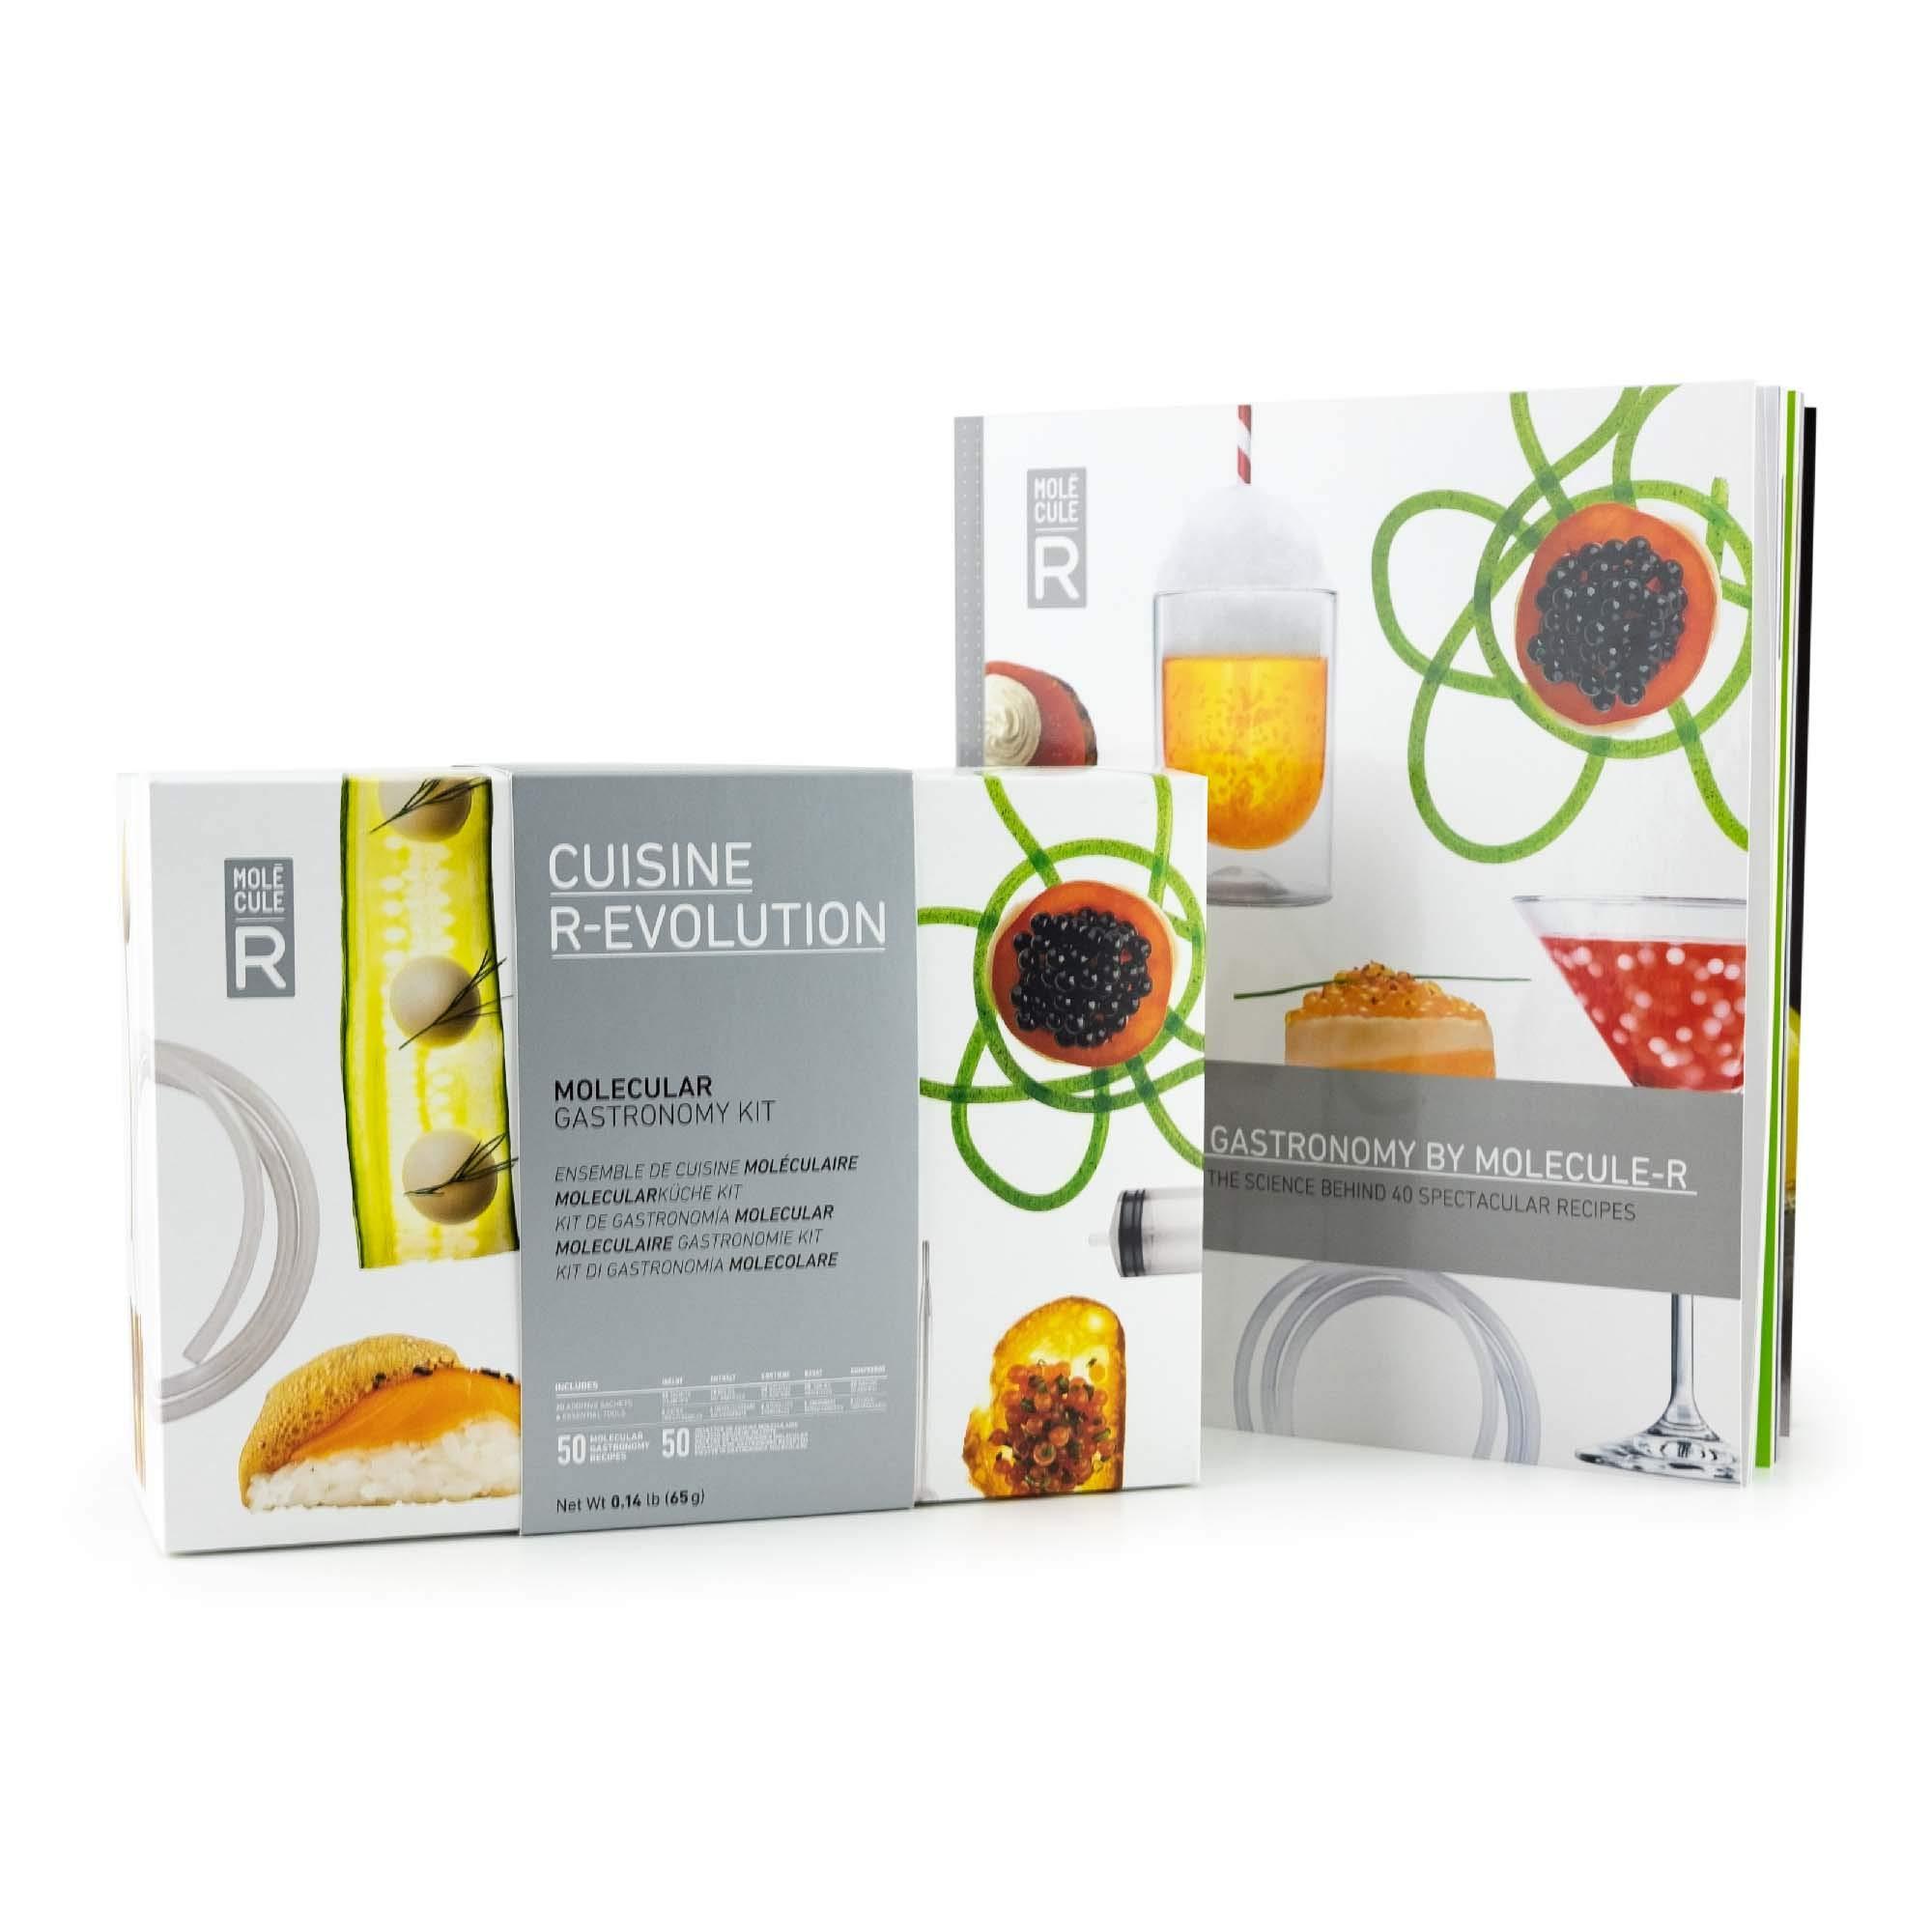 Molecule-R - Molecular Gastronomy Starter Kit + FREE Recipe Book - Spherification Kit - CUISINE R-EVOLUTION